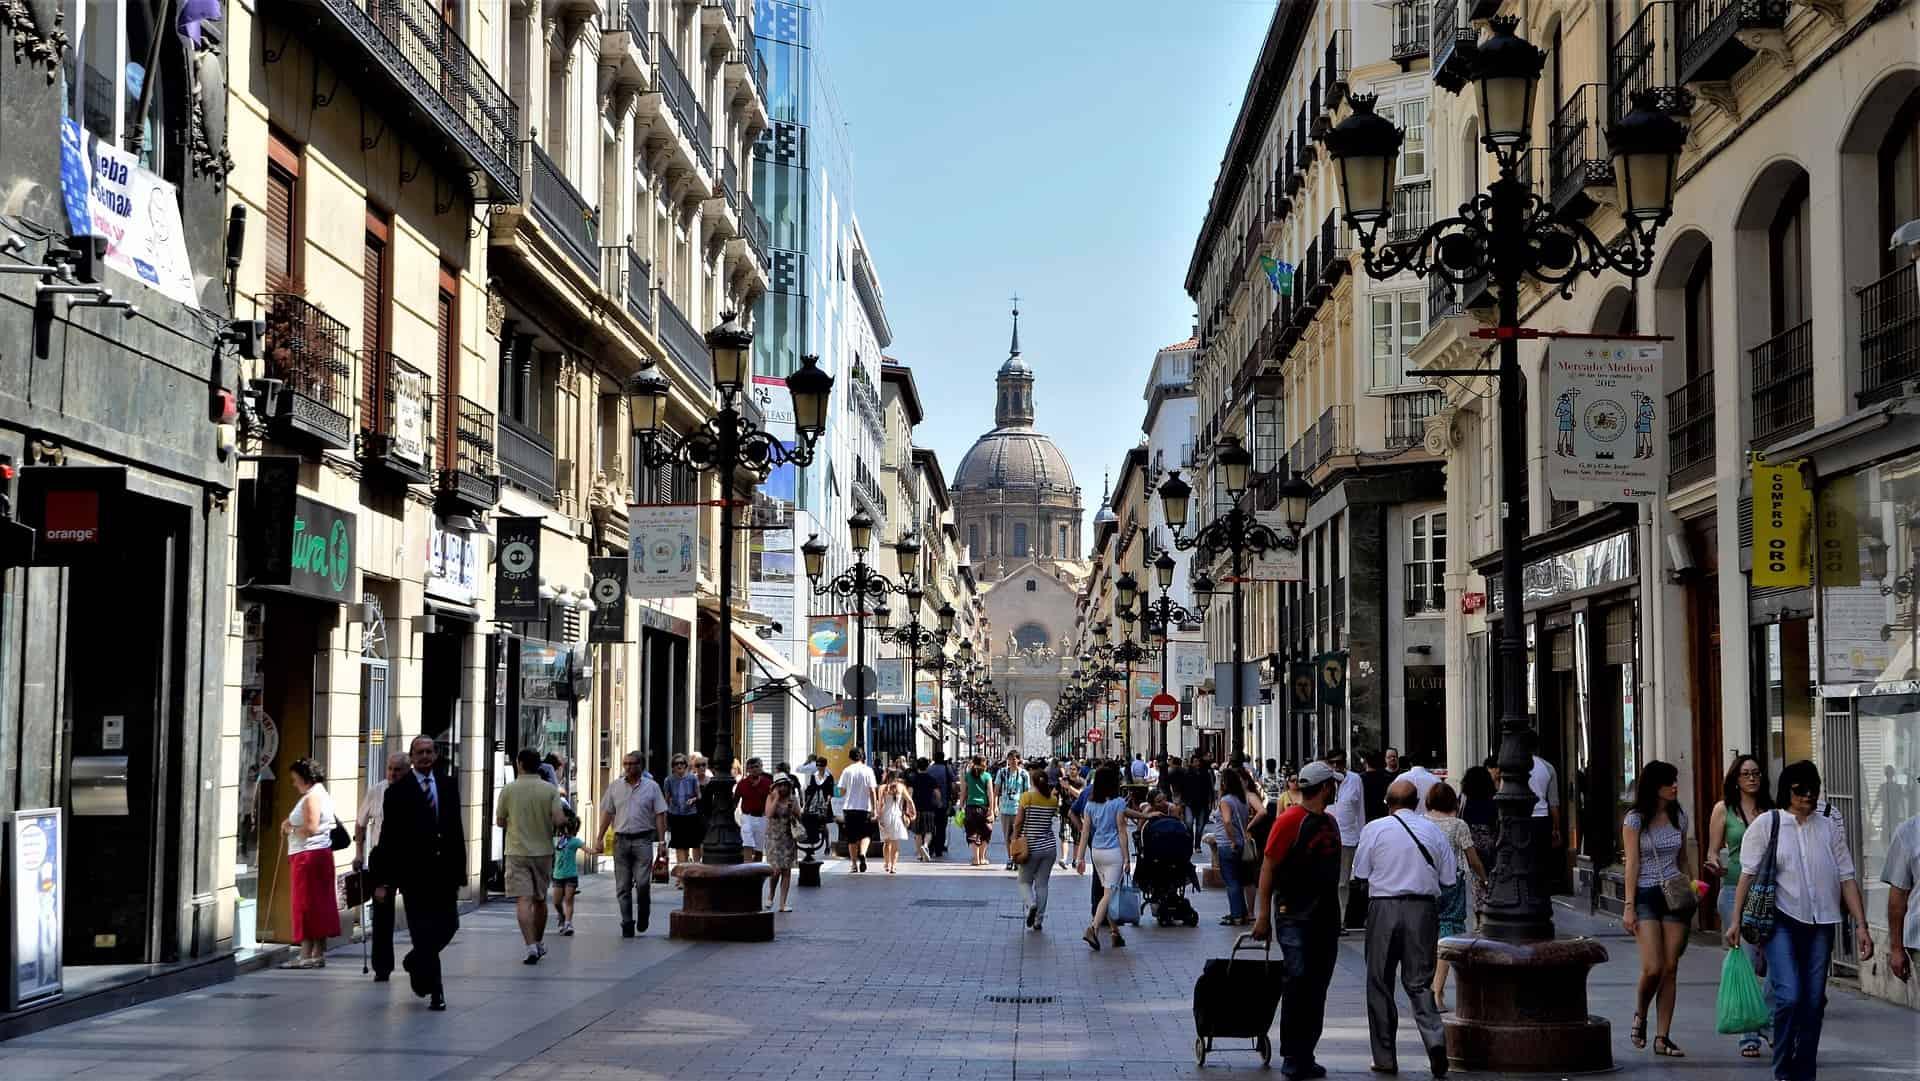 Zaragoza town centre